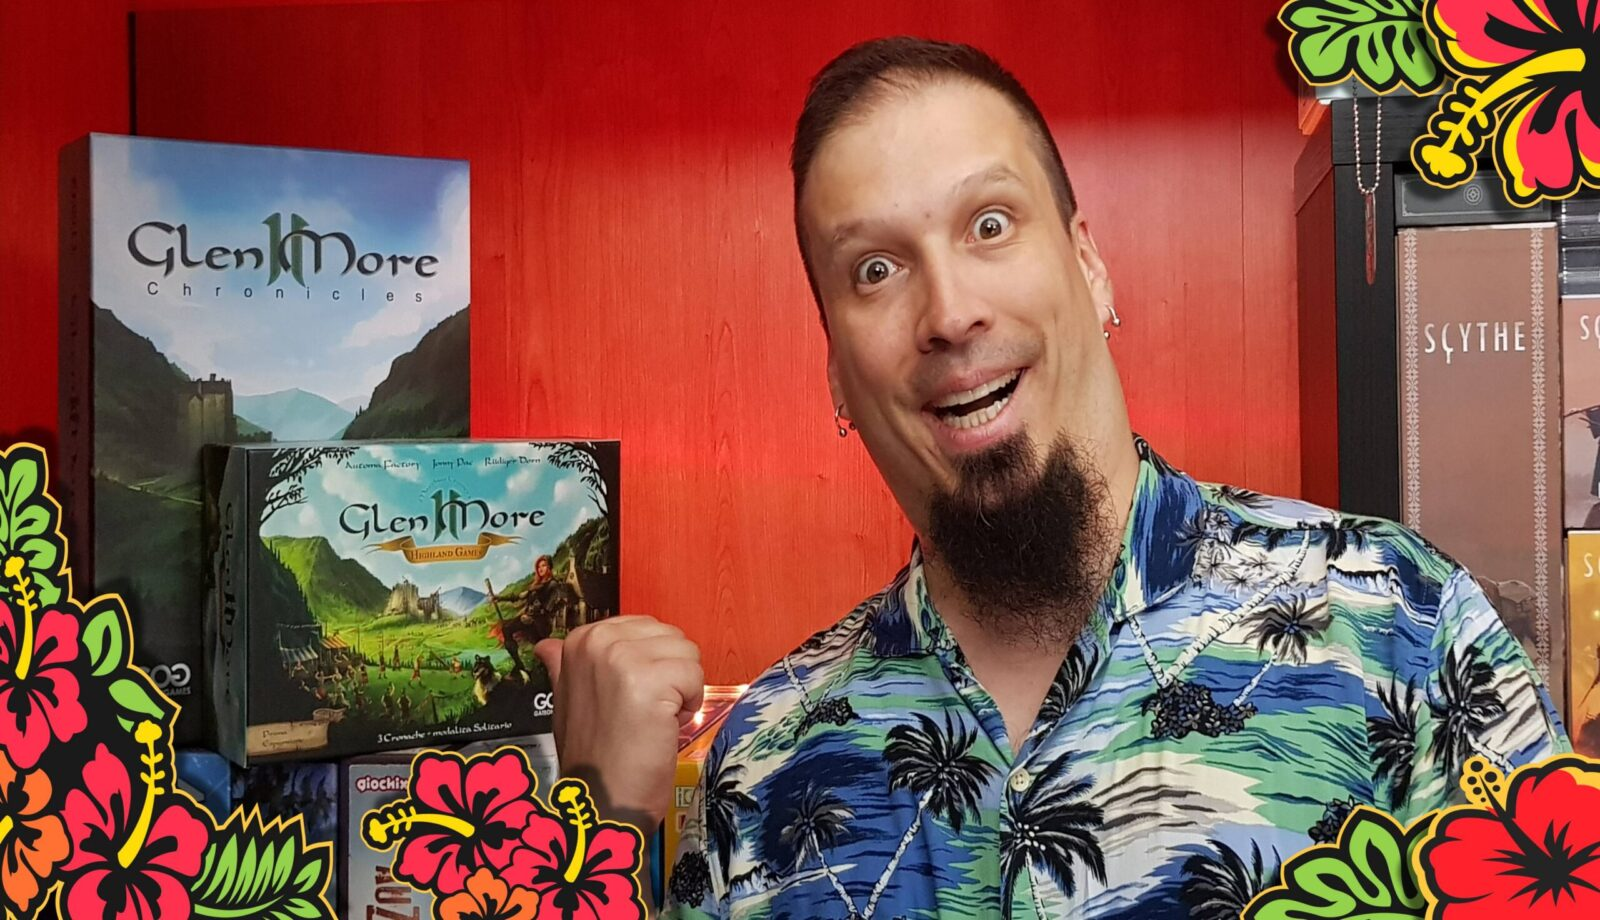 Glen More II Chronicles + Highland games